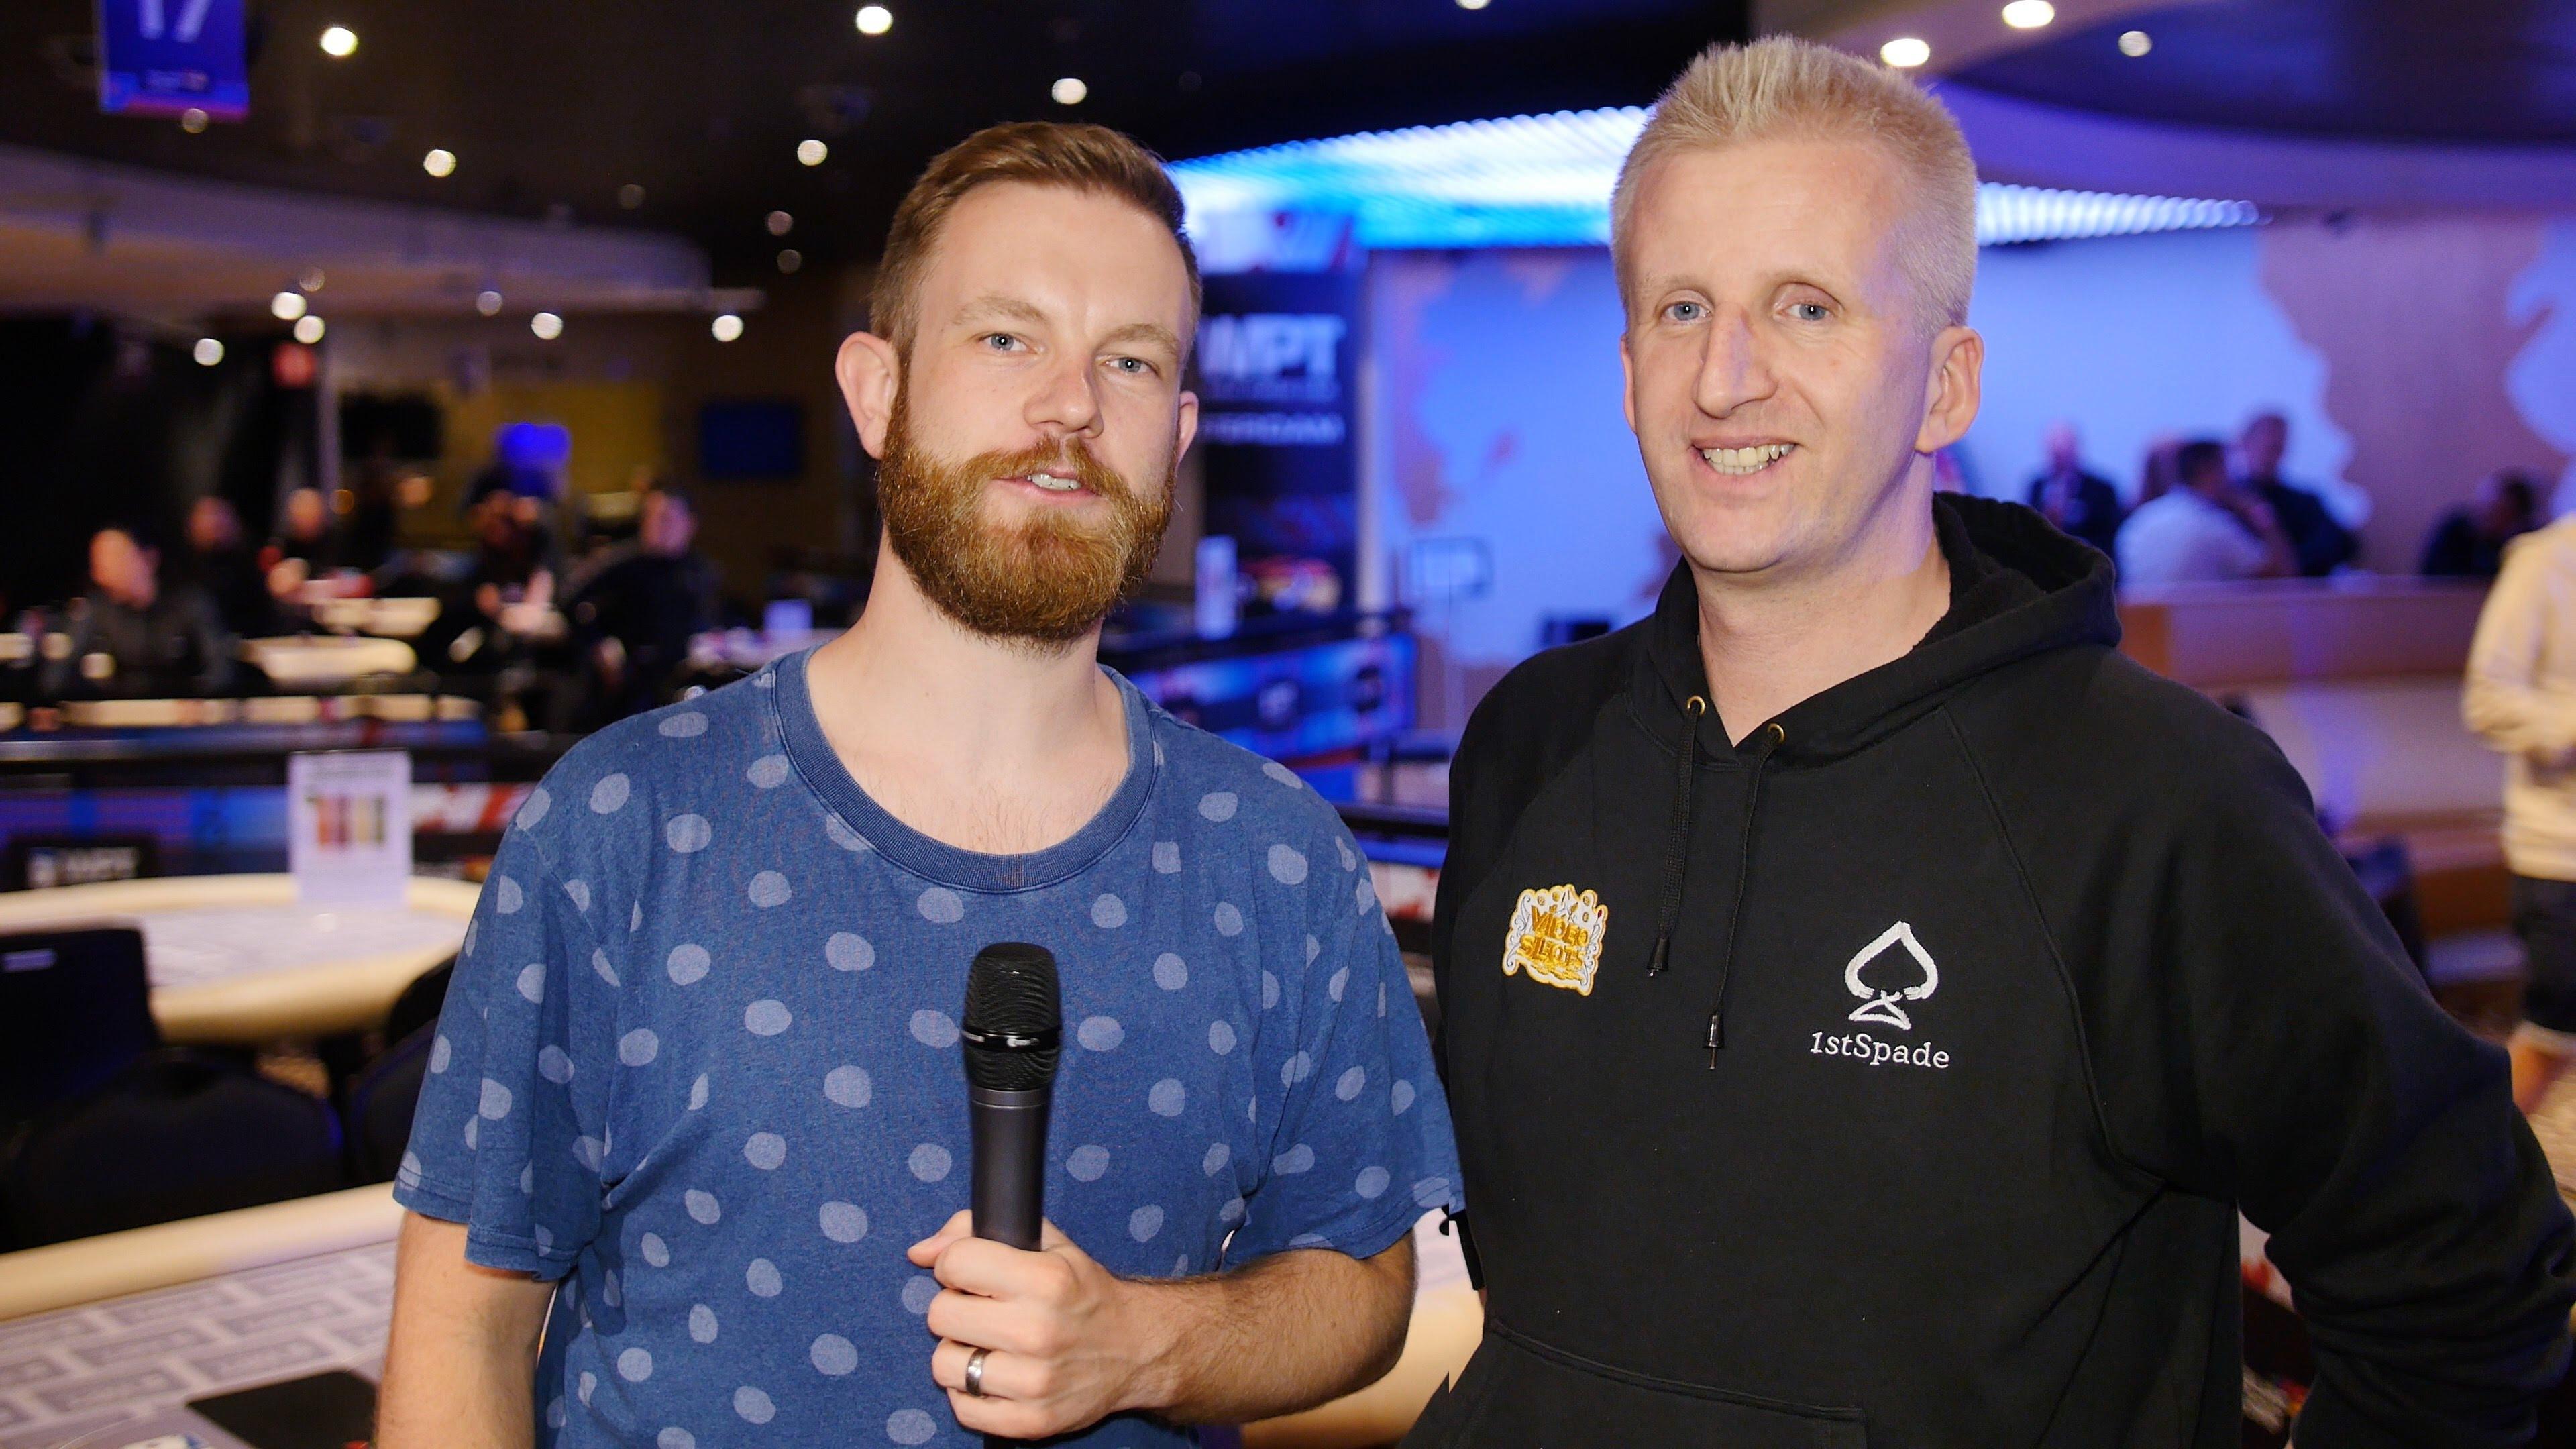 Andreas Hoivold On High Stakes Poker